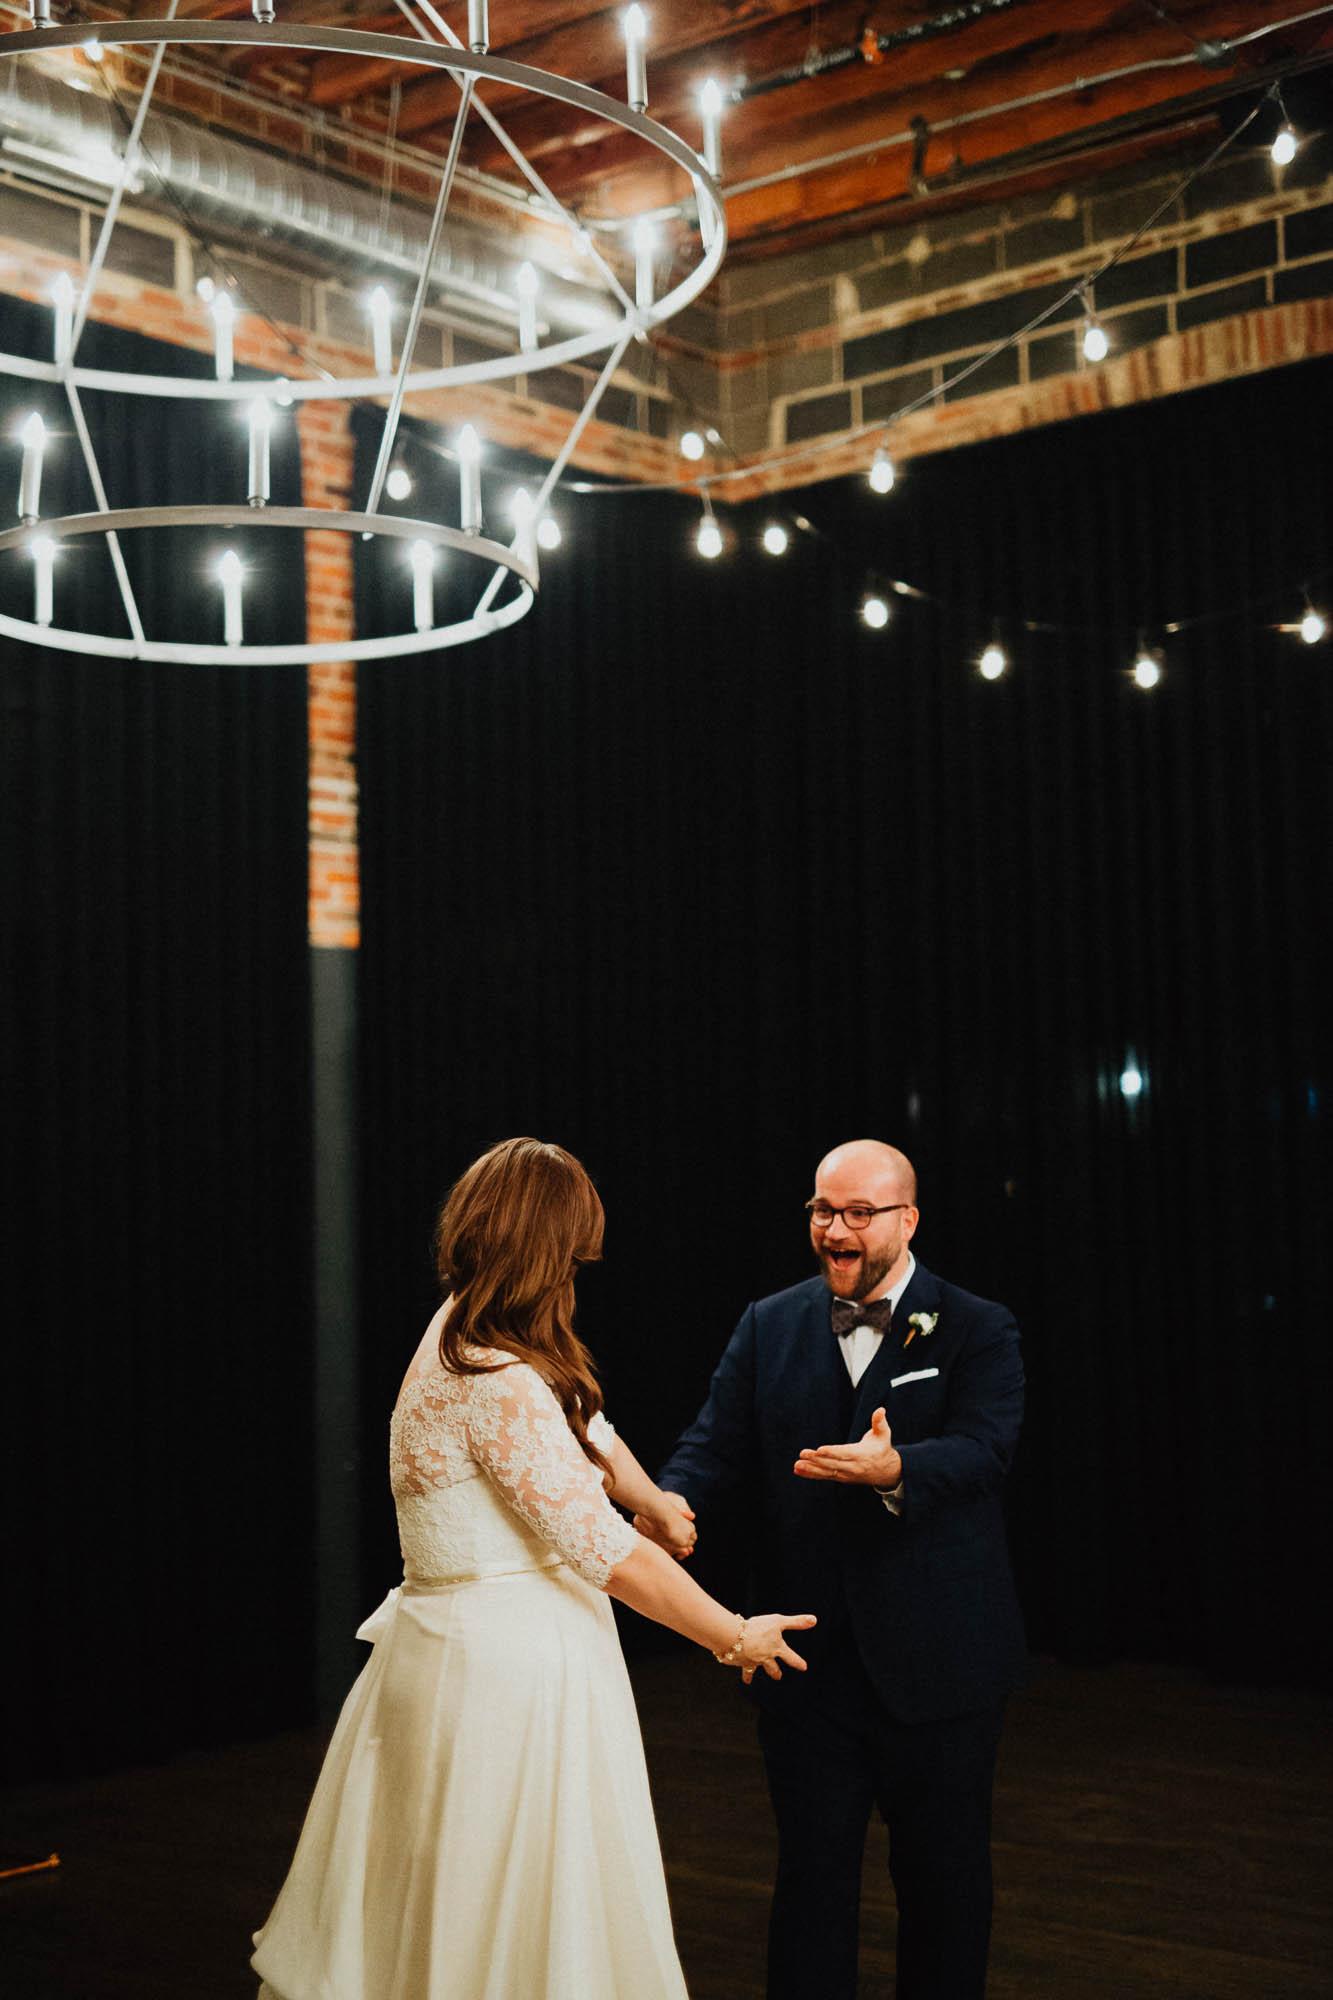 Highline-Car-House-Wedding-Columbus-Kristin-Aaron-112.jpg